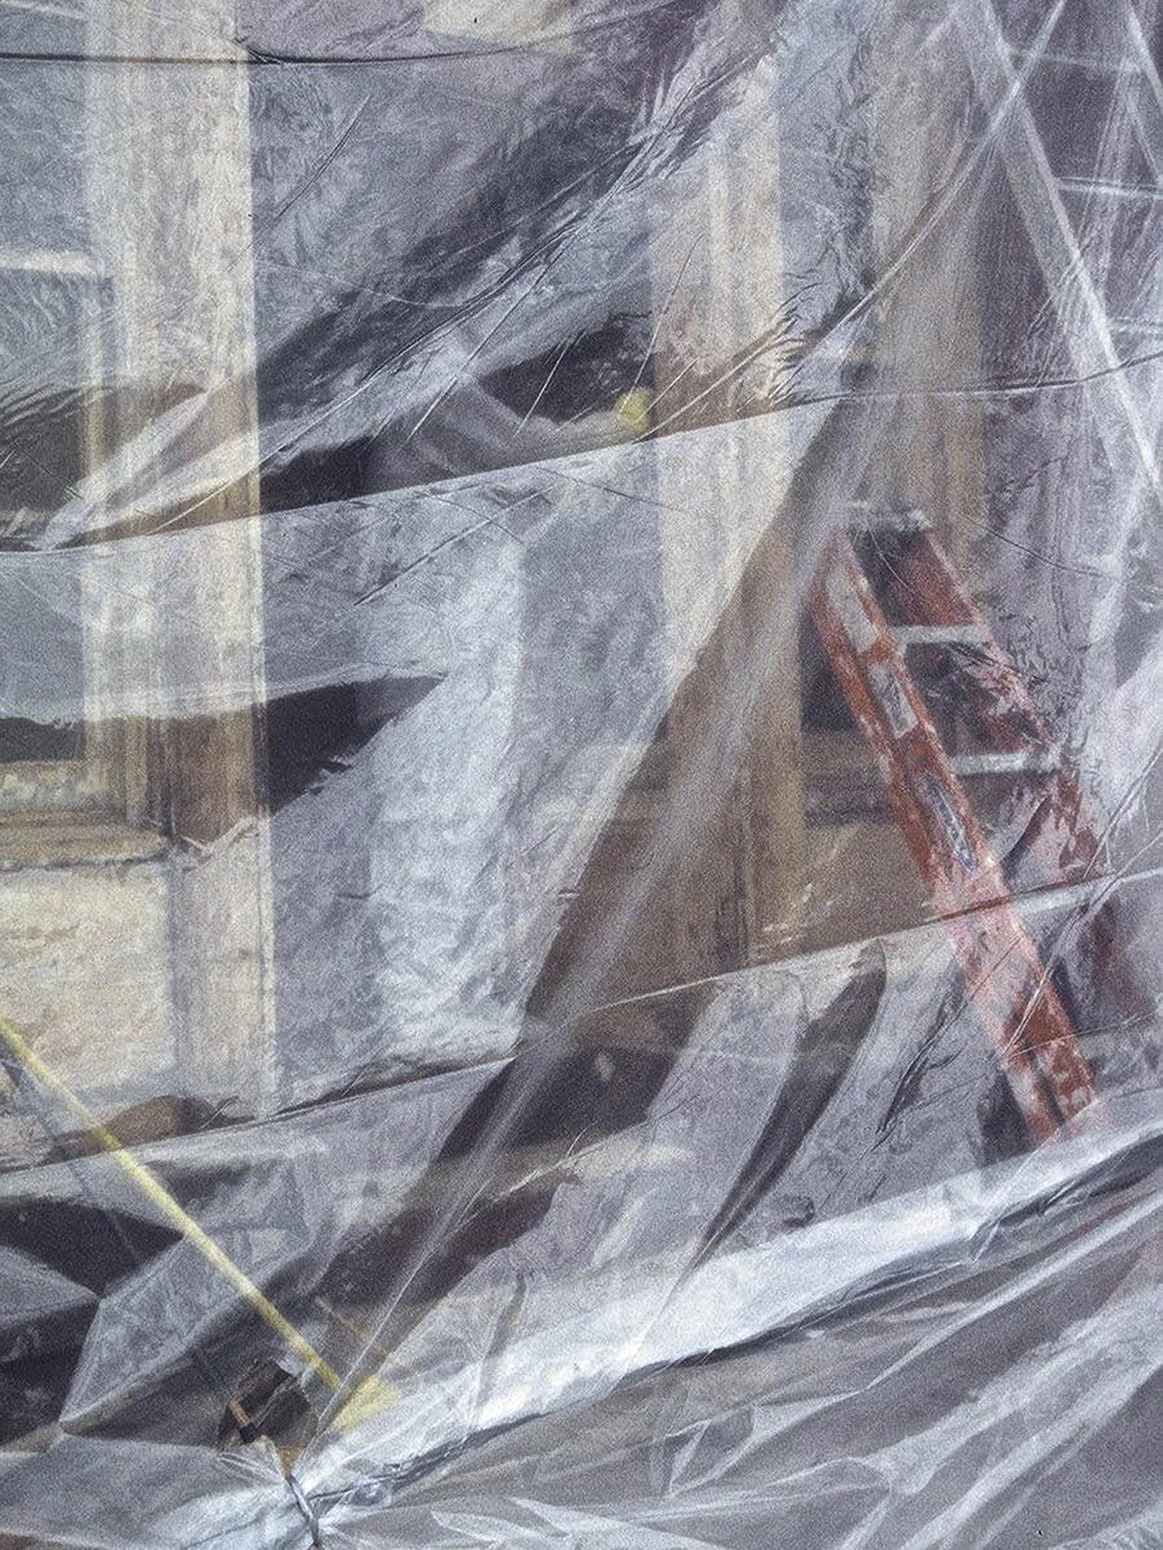 Ghostworkers II, Dobbs Ferry, NY